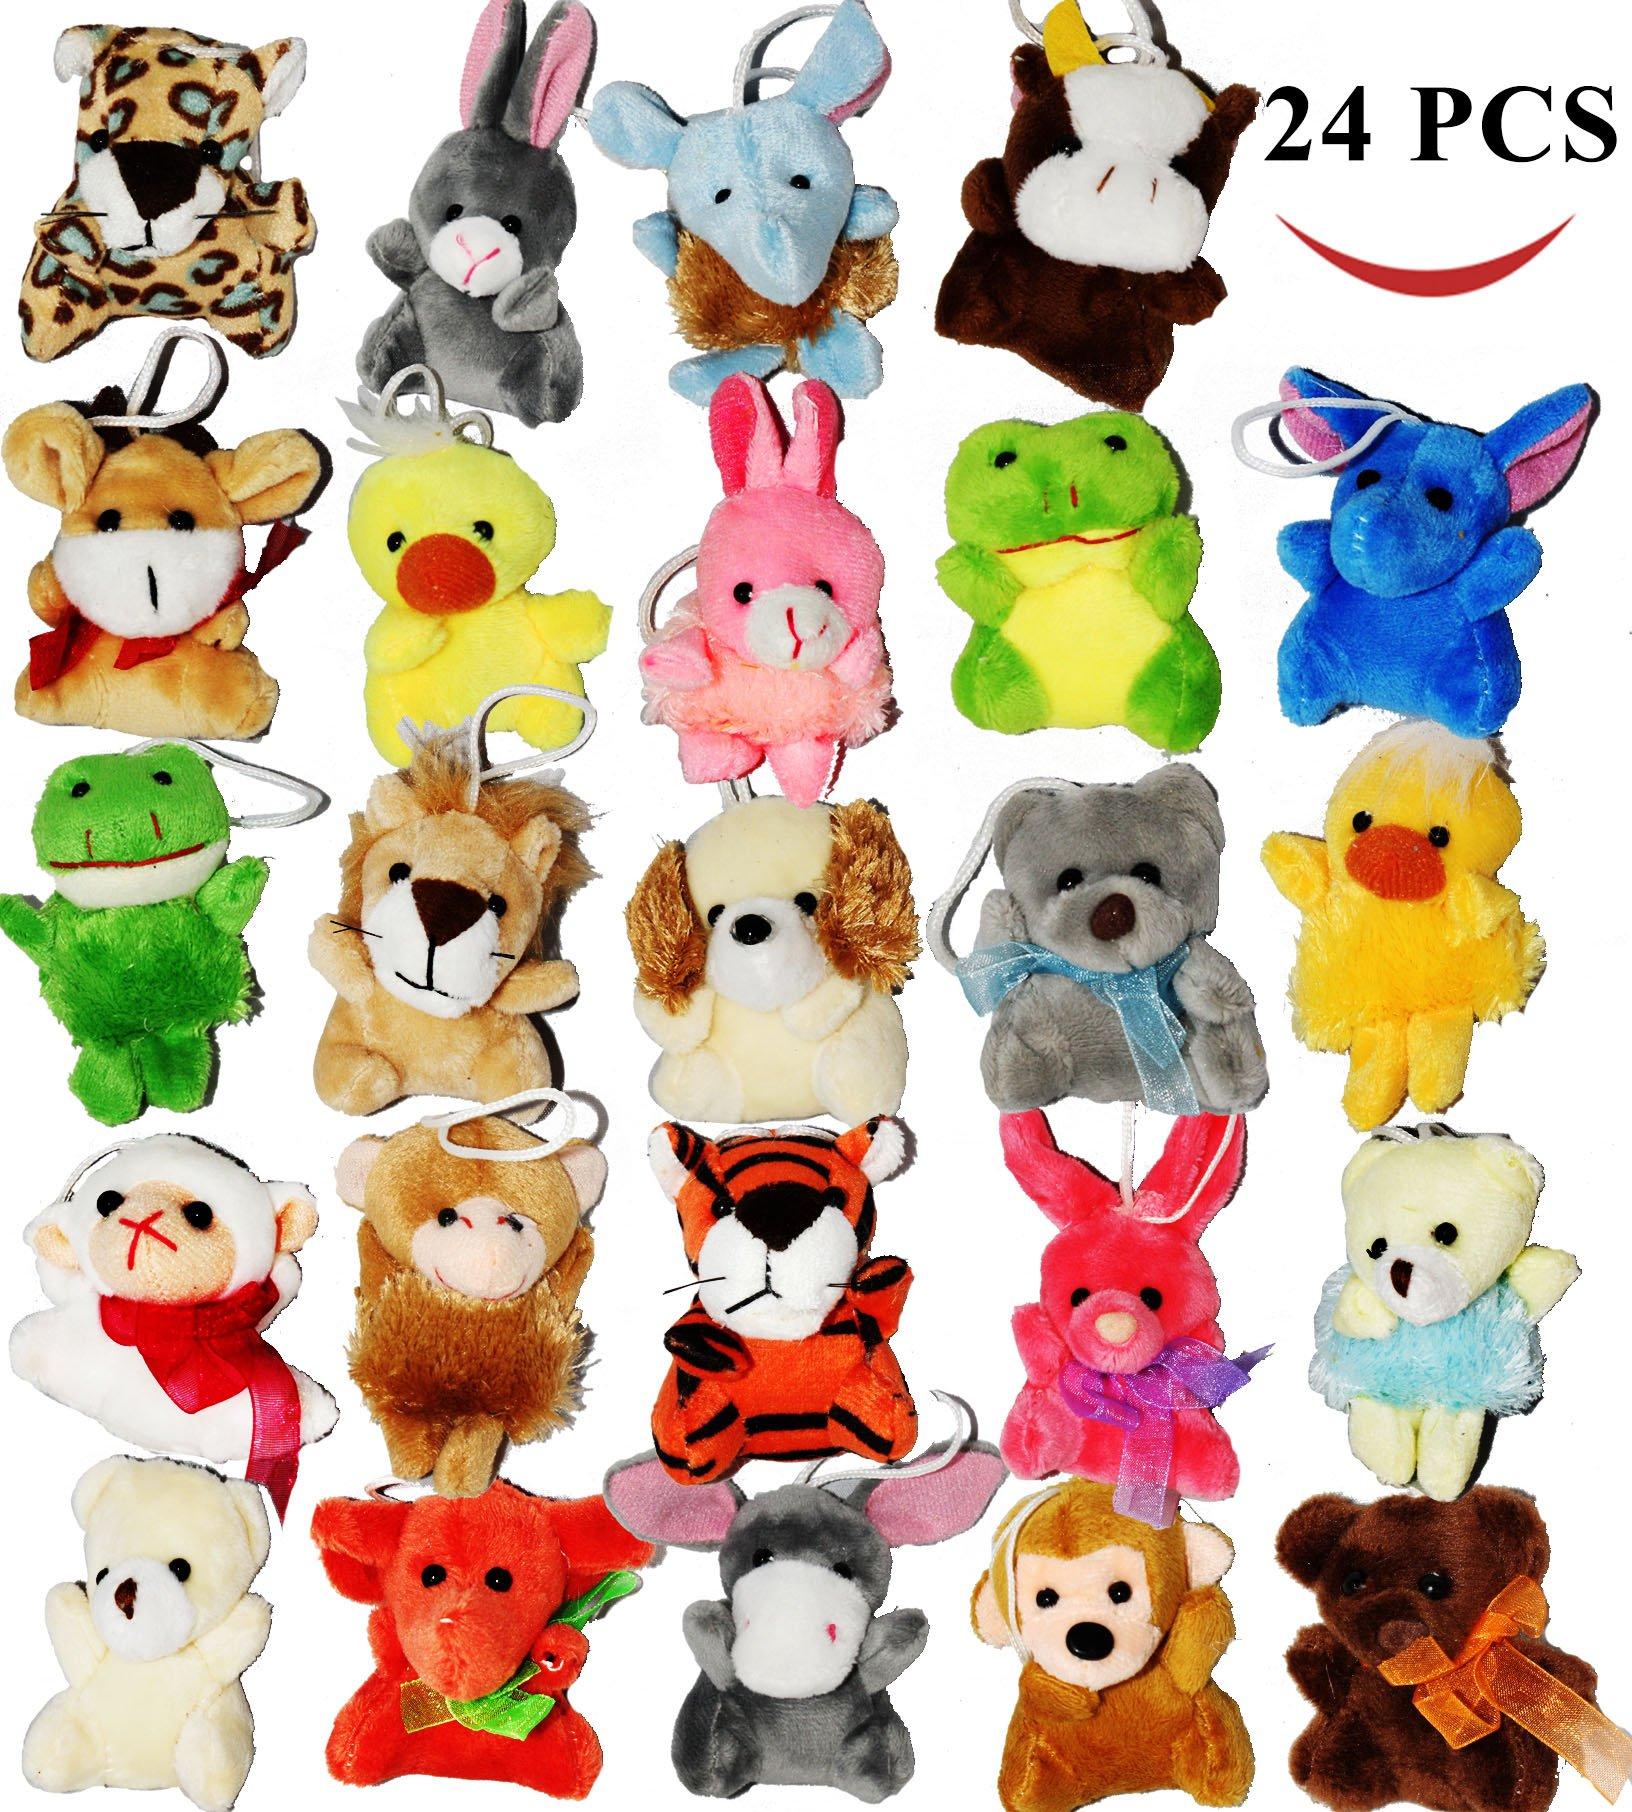 Joyin Toy 24 Pack of Mini Animal Plush Toy Assortment (24 units 3'' each) Kids Party Favors